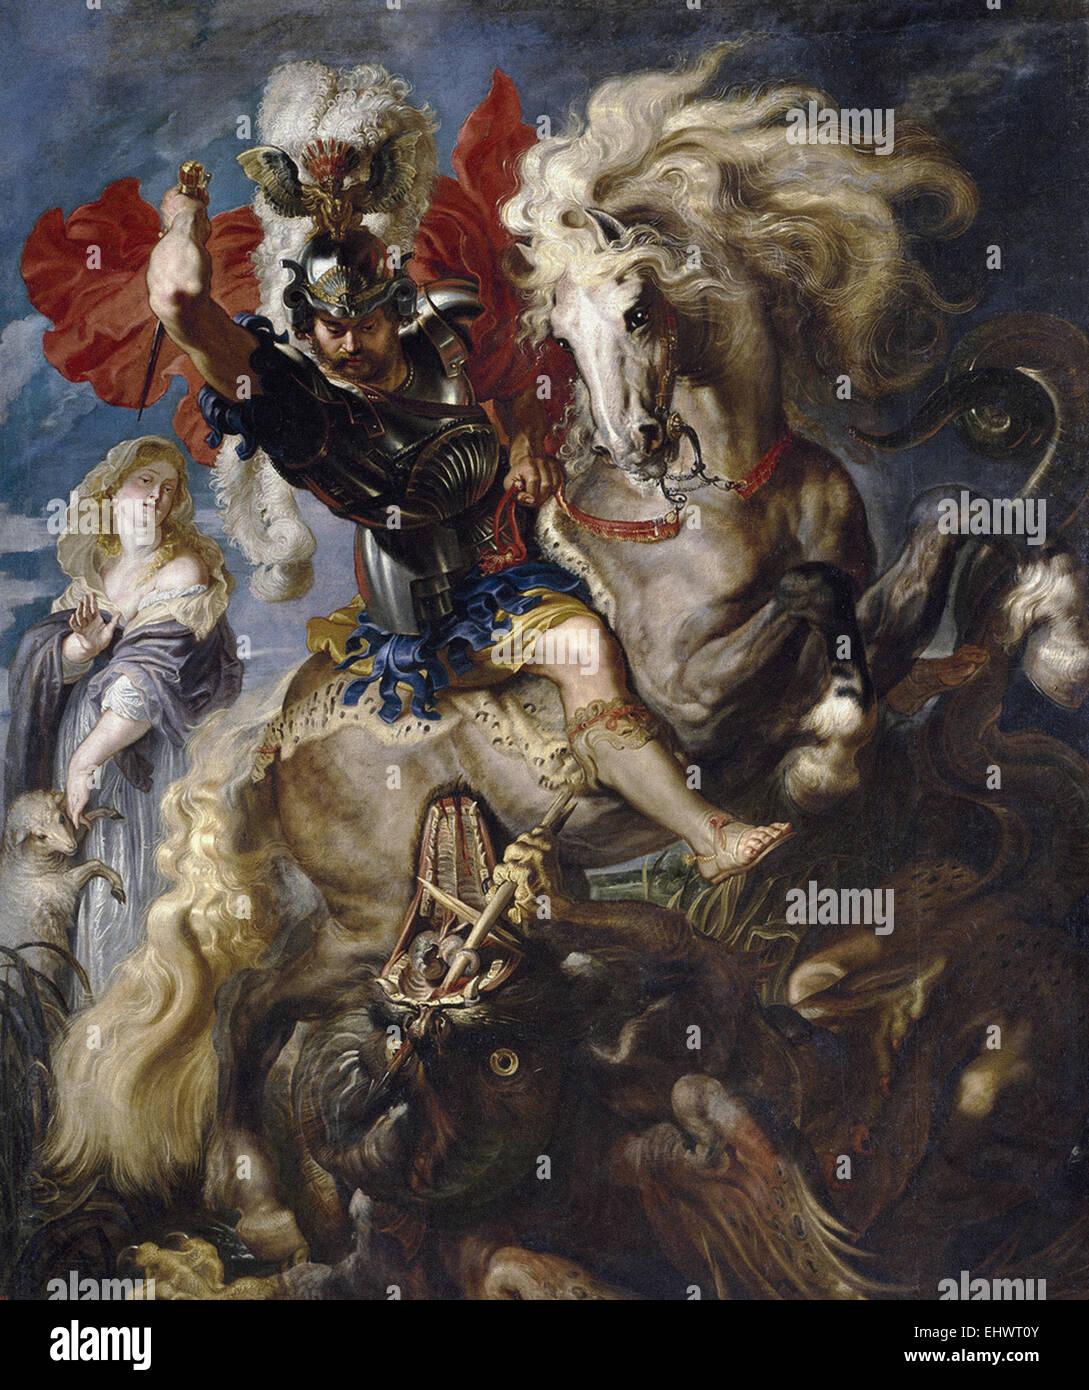 Peter Paul Rubens  Saint George Battles the Dragon - Stock Image